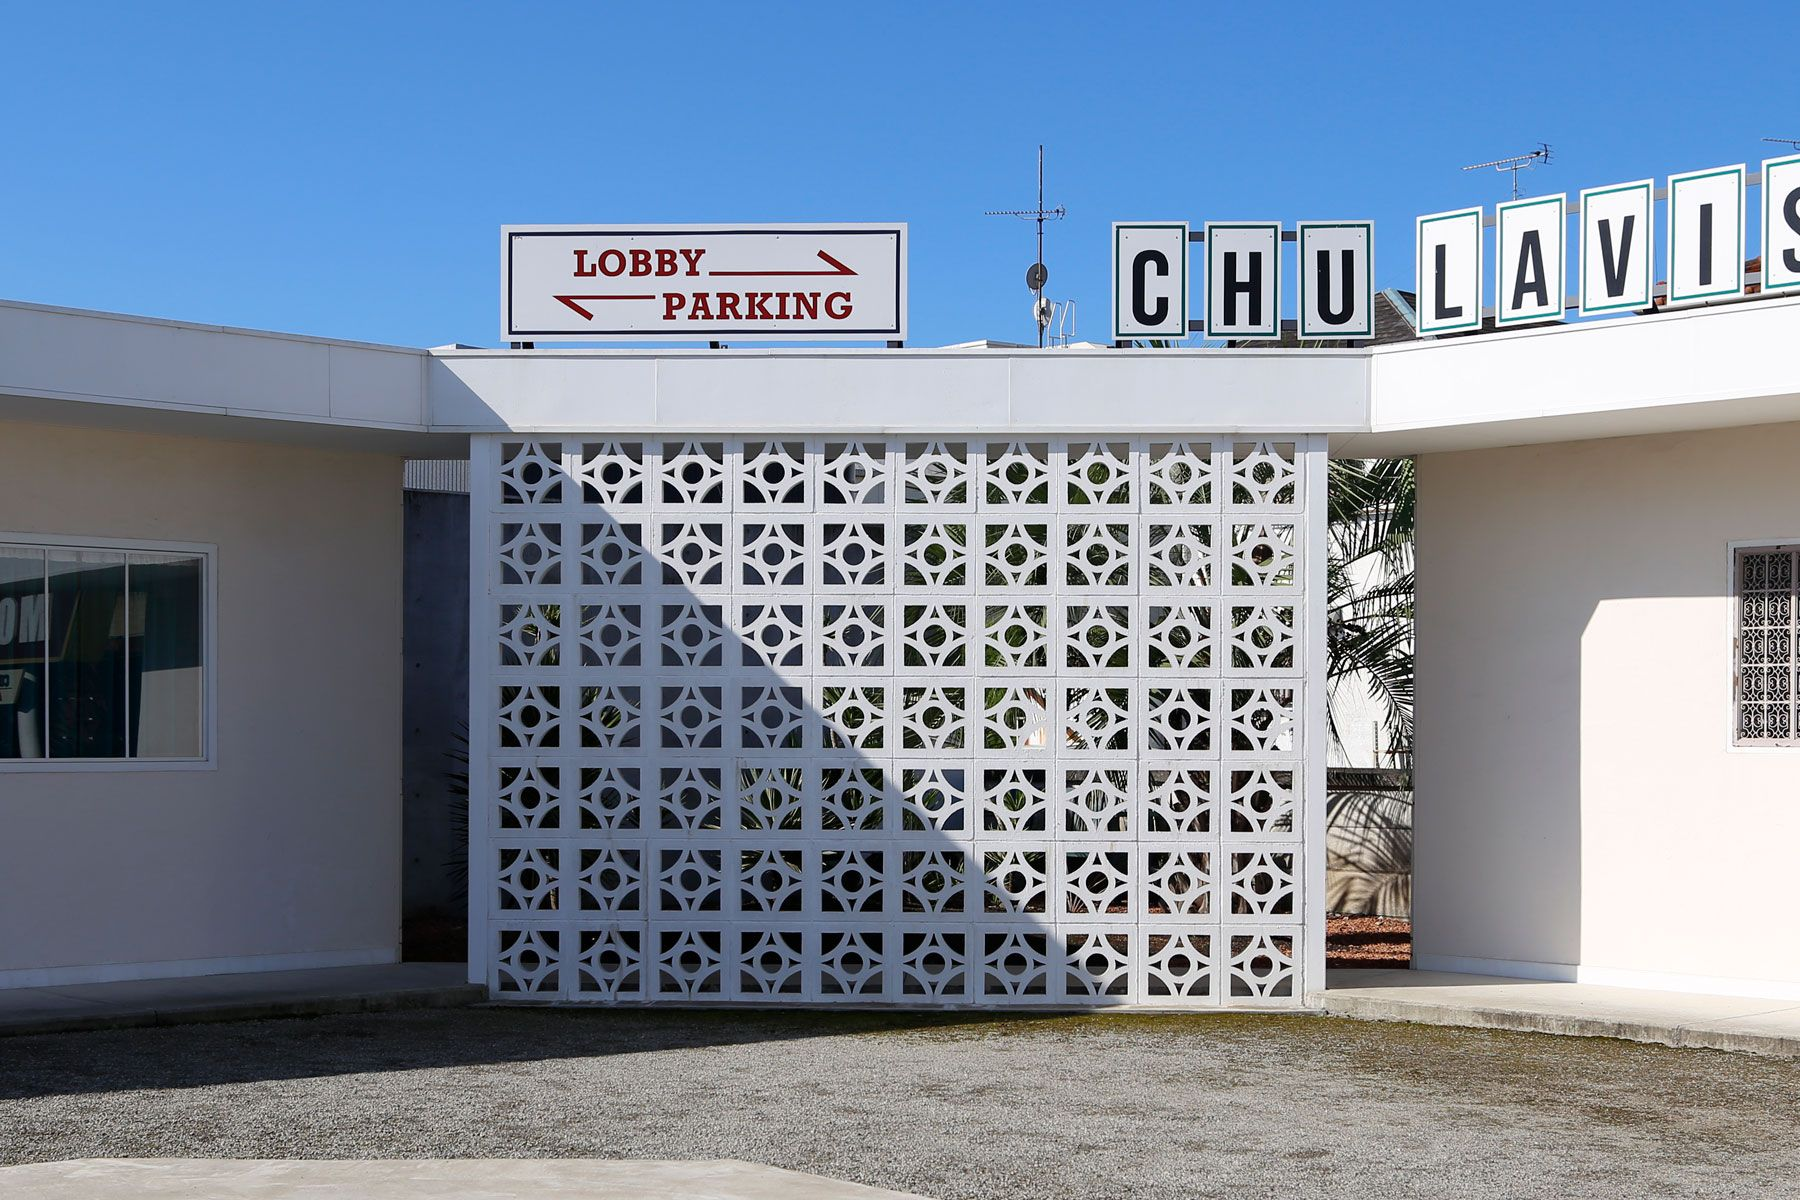 chula vista(チュラ ビスタ) /FUJIYAMA LOCATION SERVICES